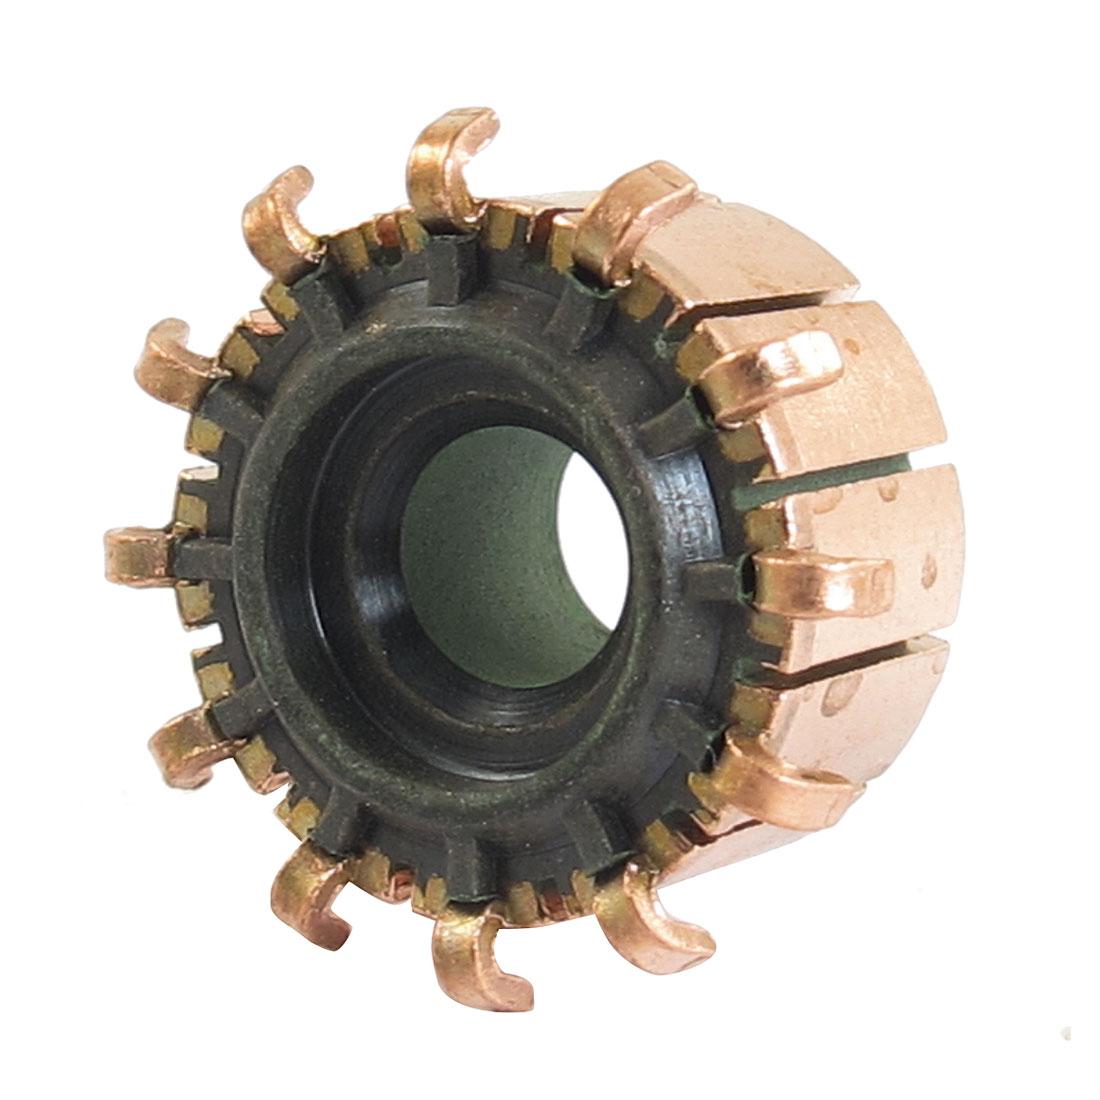 6mm x 16.5mm x 11.5mm 12P Copper Bars Alternator Electric Motor Commutator